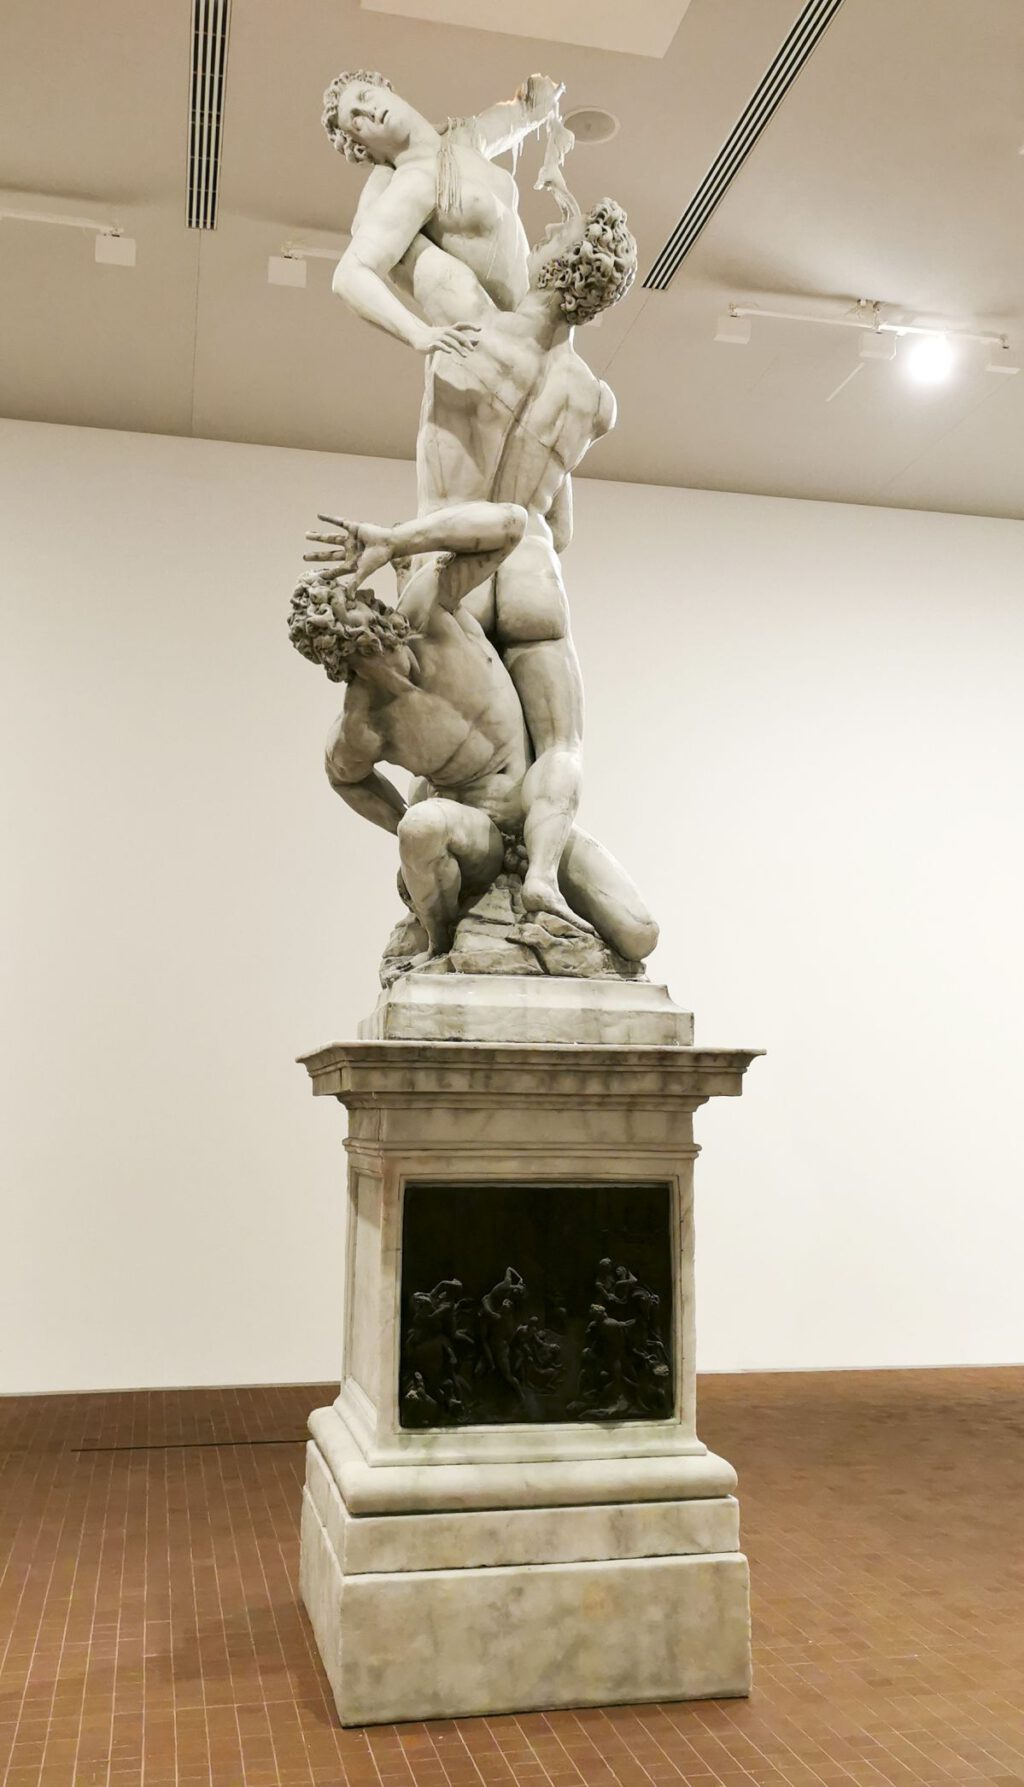 "Urs Fischer ""Untitled"" (2011) (The Rape of the Sabine Women) @ Collection Maja Hoffmann, LUMA Arles 2021"